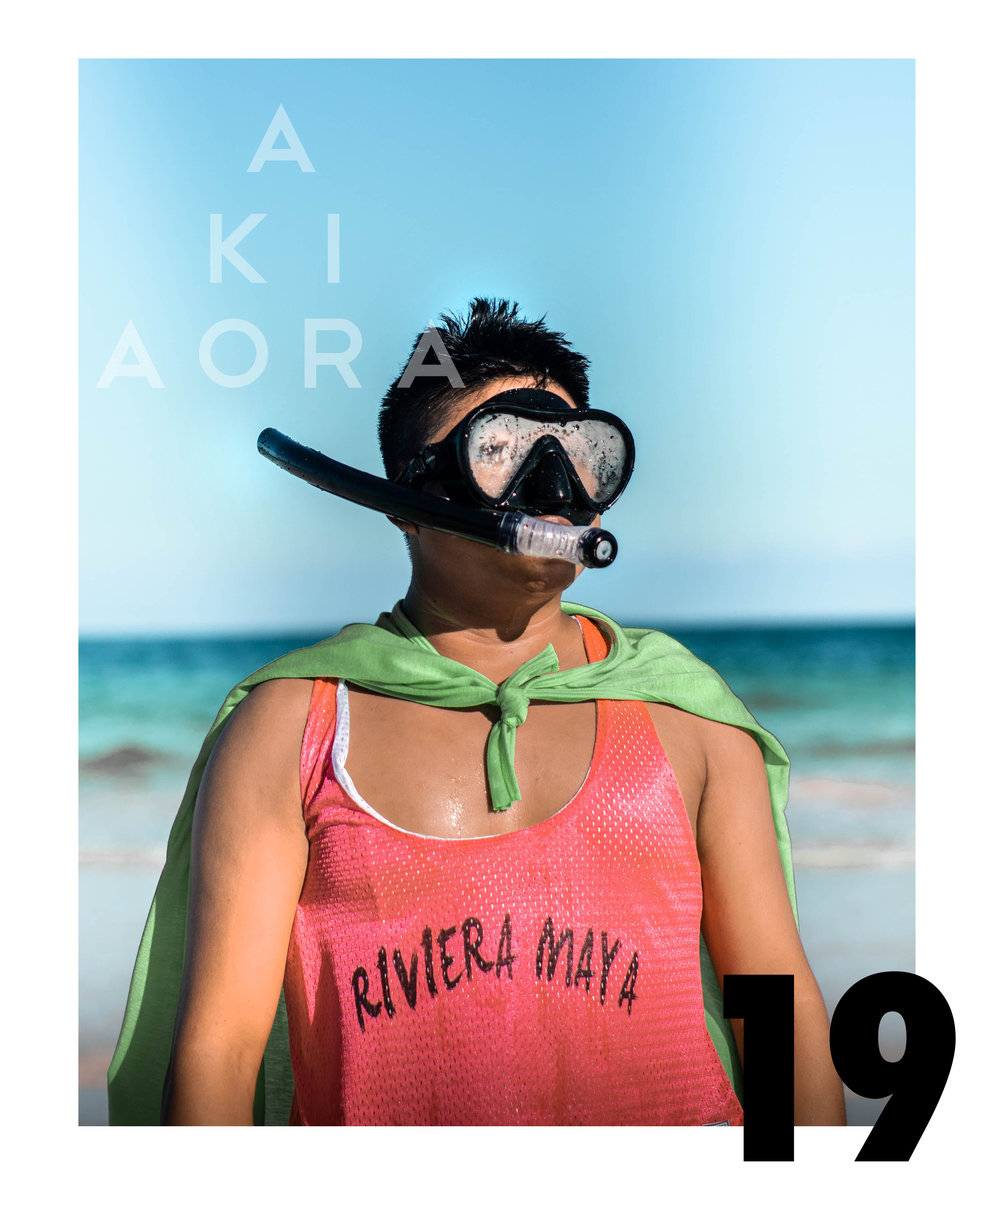 AKI AORA 2019 Edition